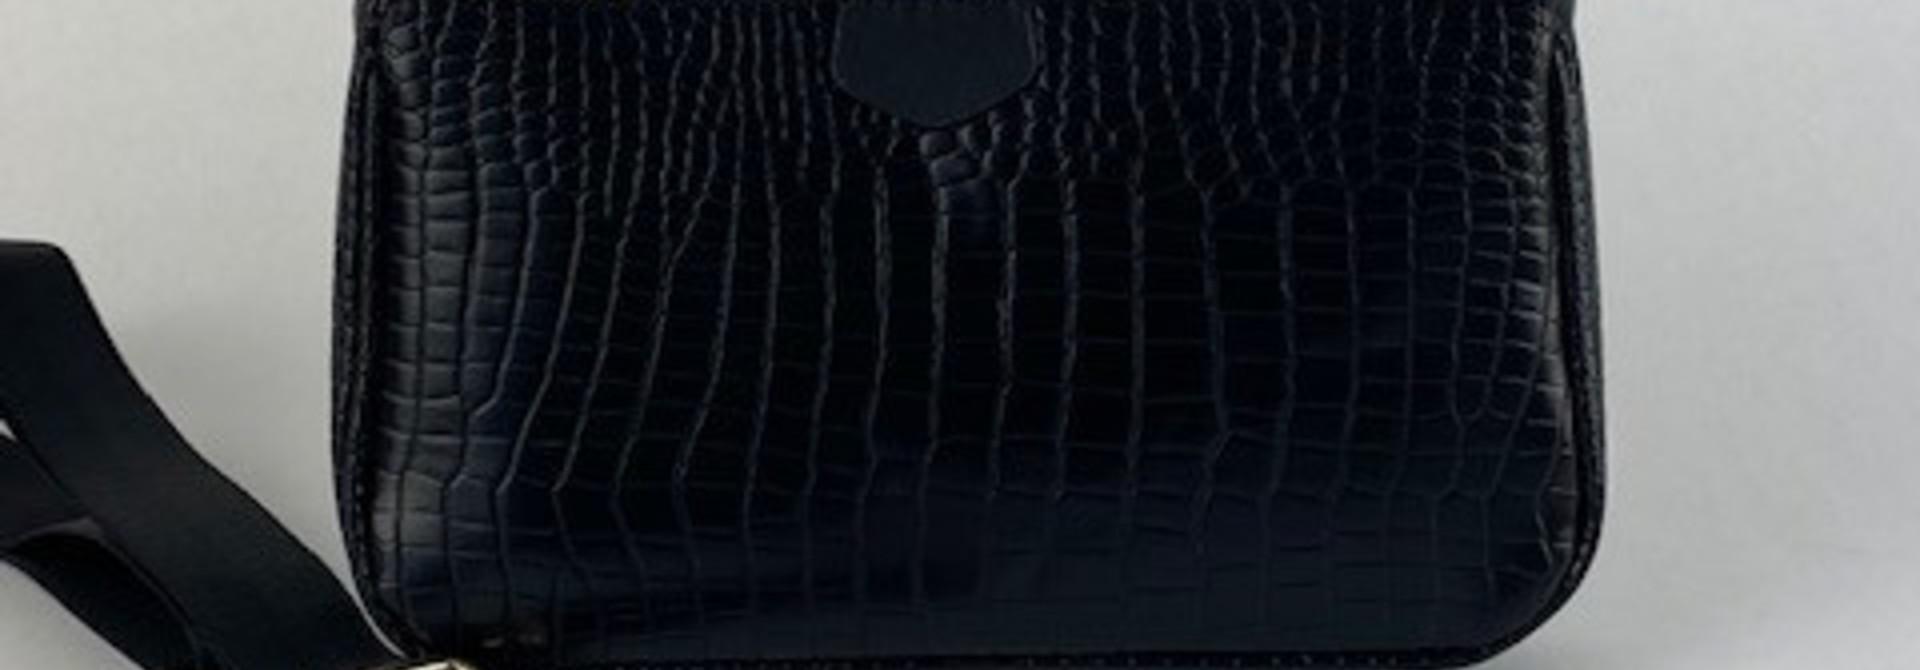 Celina triple croco bag Black